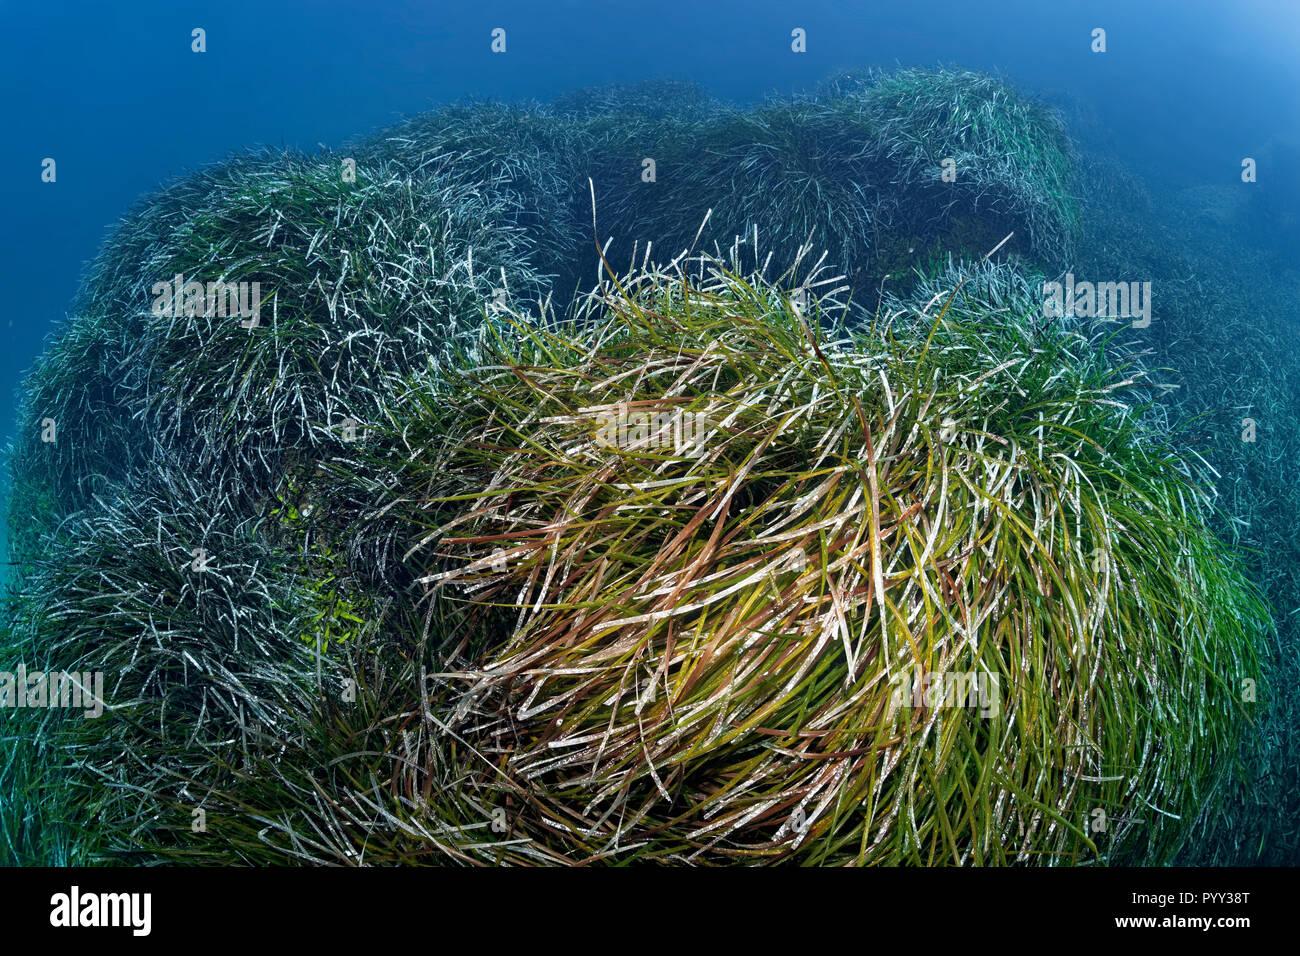 Neptune Grass (Posidonia oceanica), Mediterranean Sea, Southern Cyprus, Cyprus - Stock Image